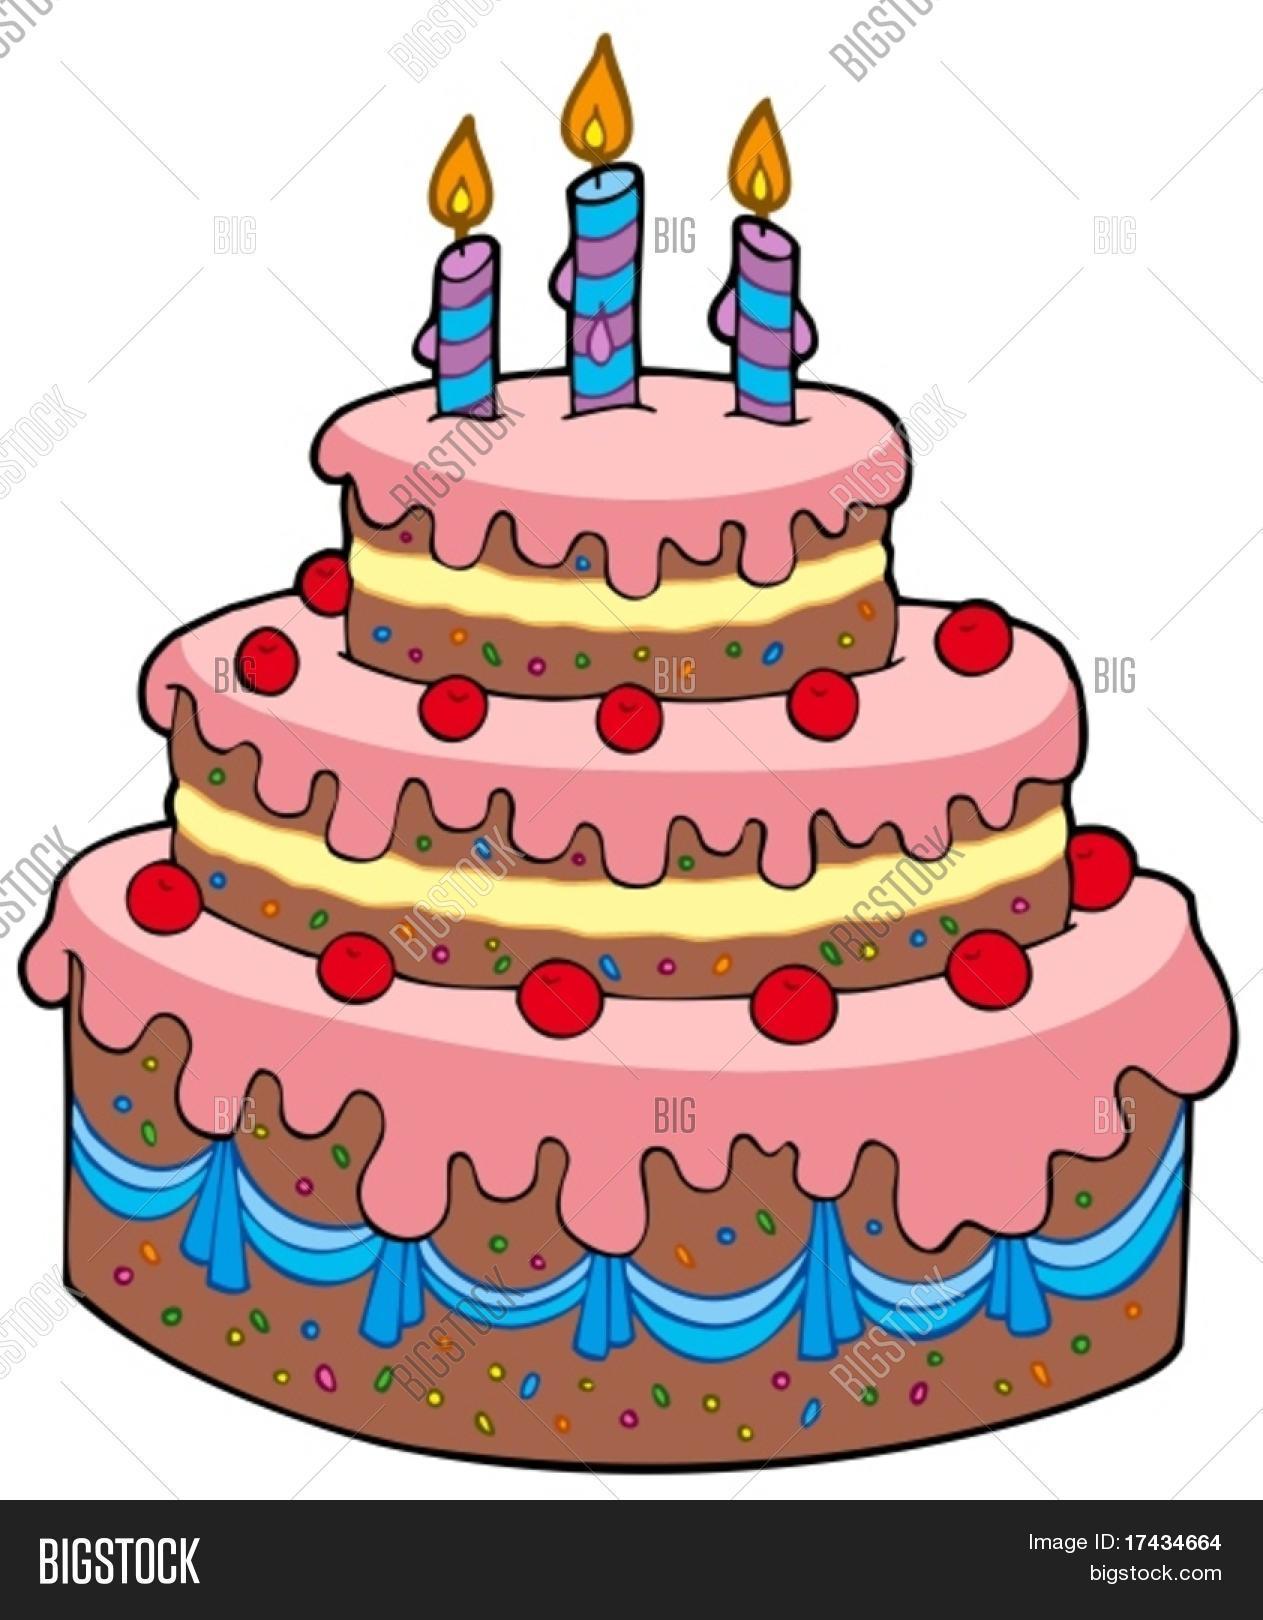 Happy Birthday Big Cake Gif